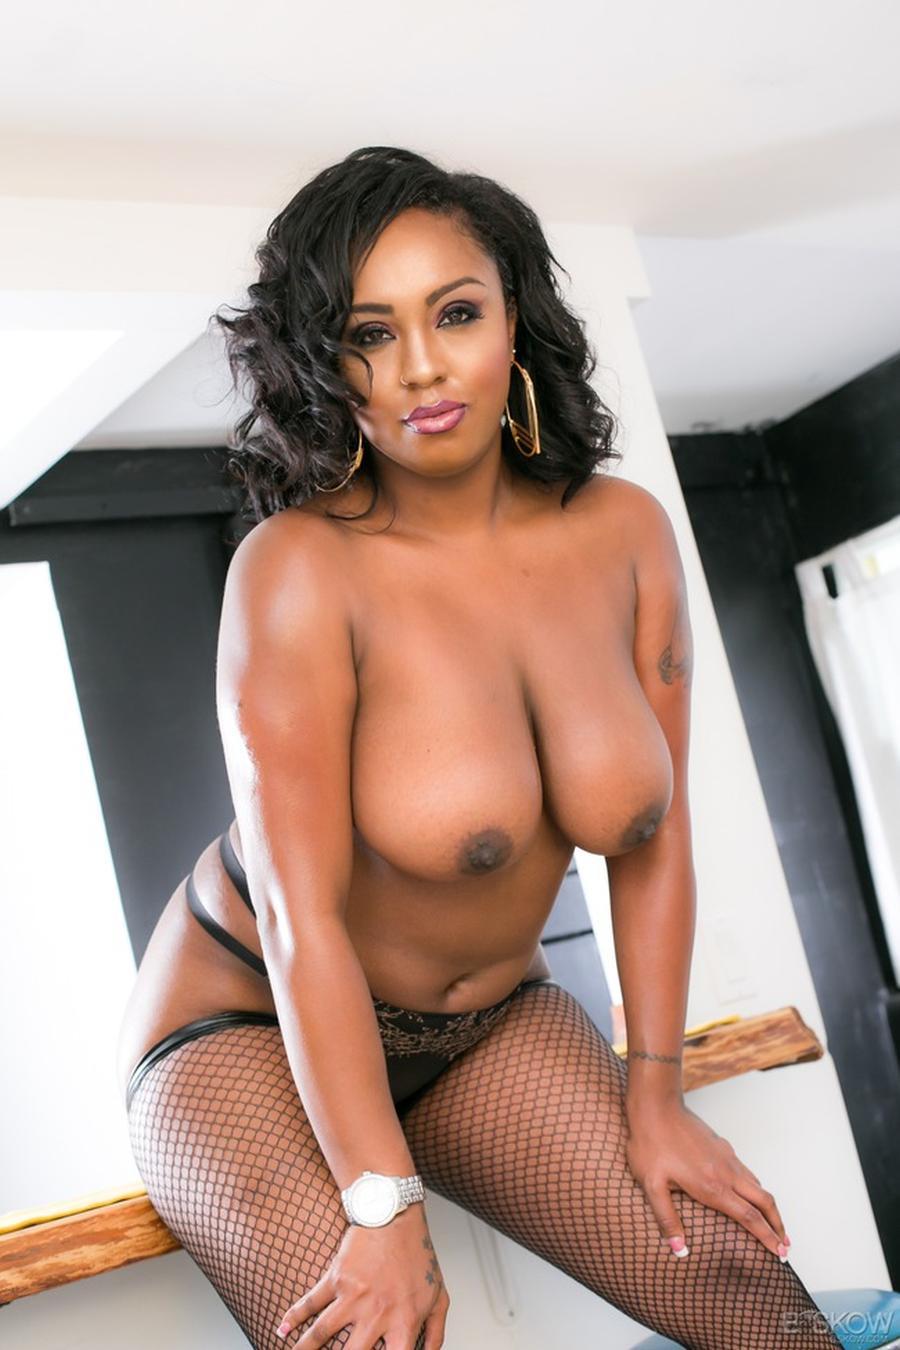 volslanke-donkere-vrouw-in-sexy-zwarte-lingerie-08